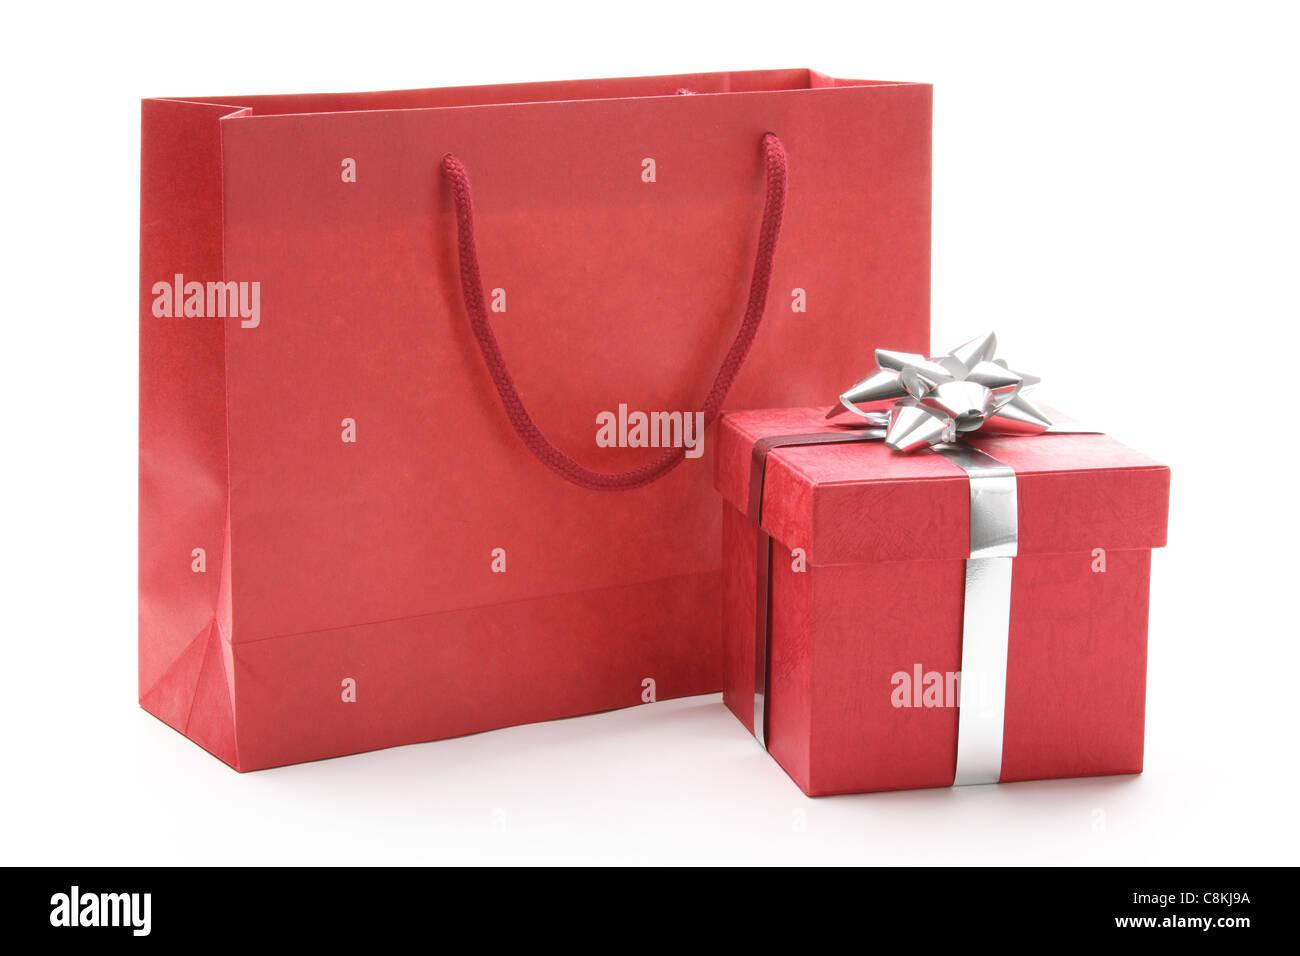 850fbc9ef8 Gift bag and gift box isolated on white background - Stock Image